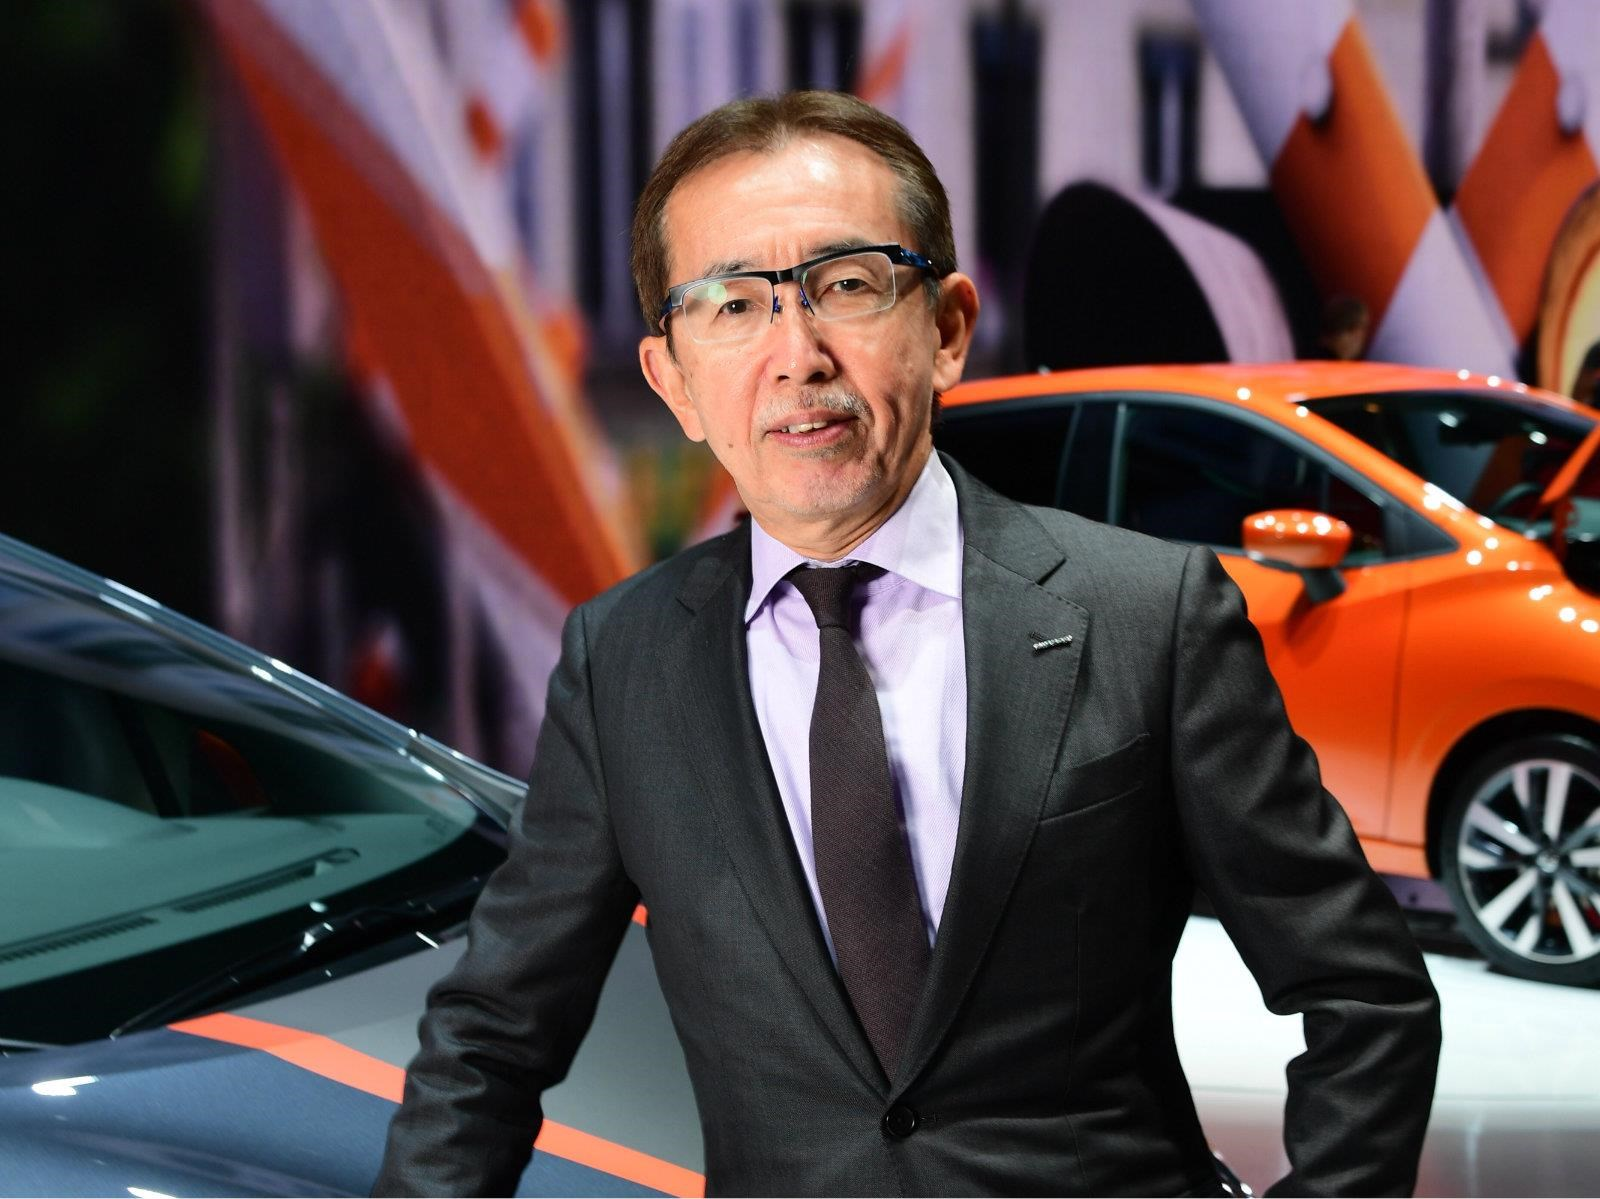 El jefe de Diseño en Nissan se retira